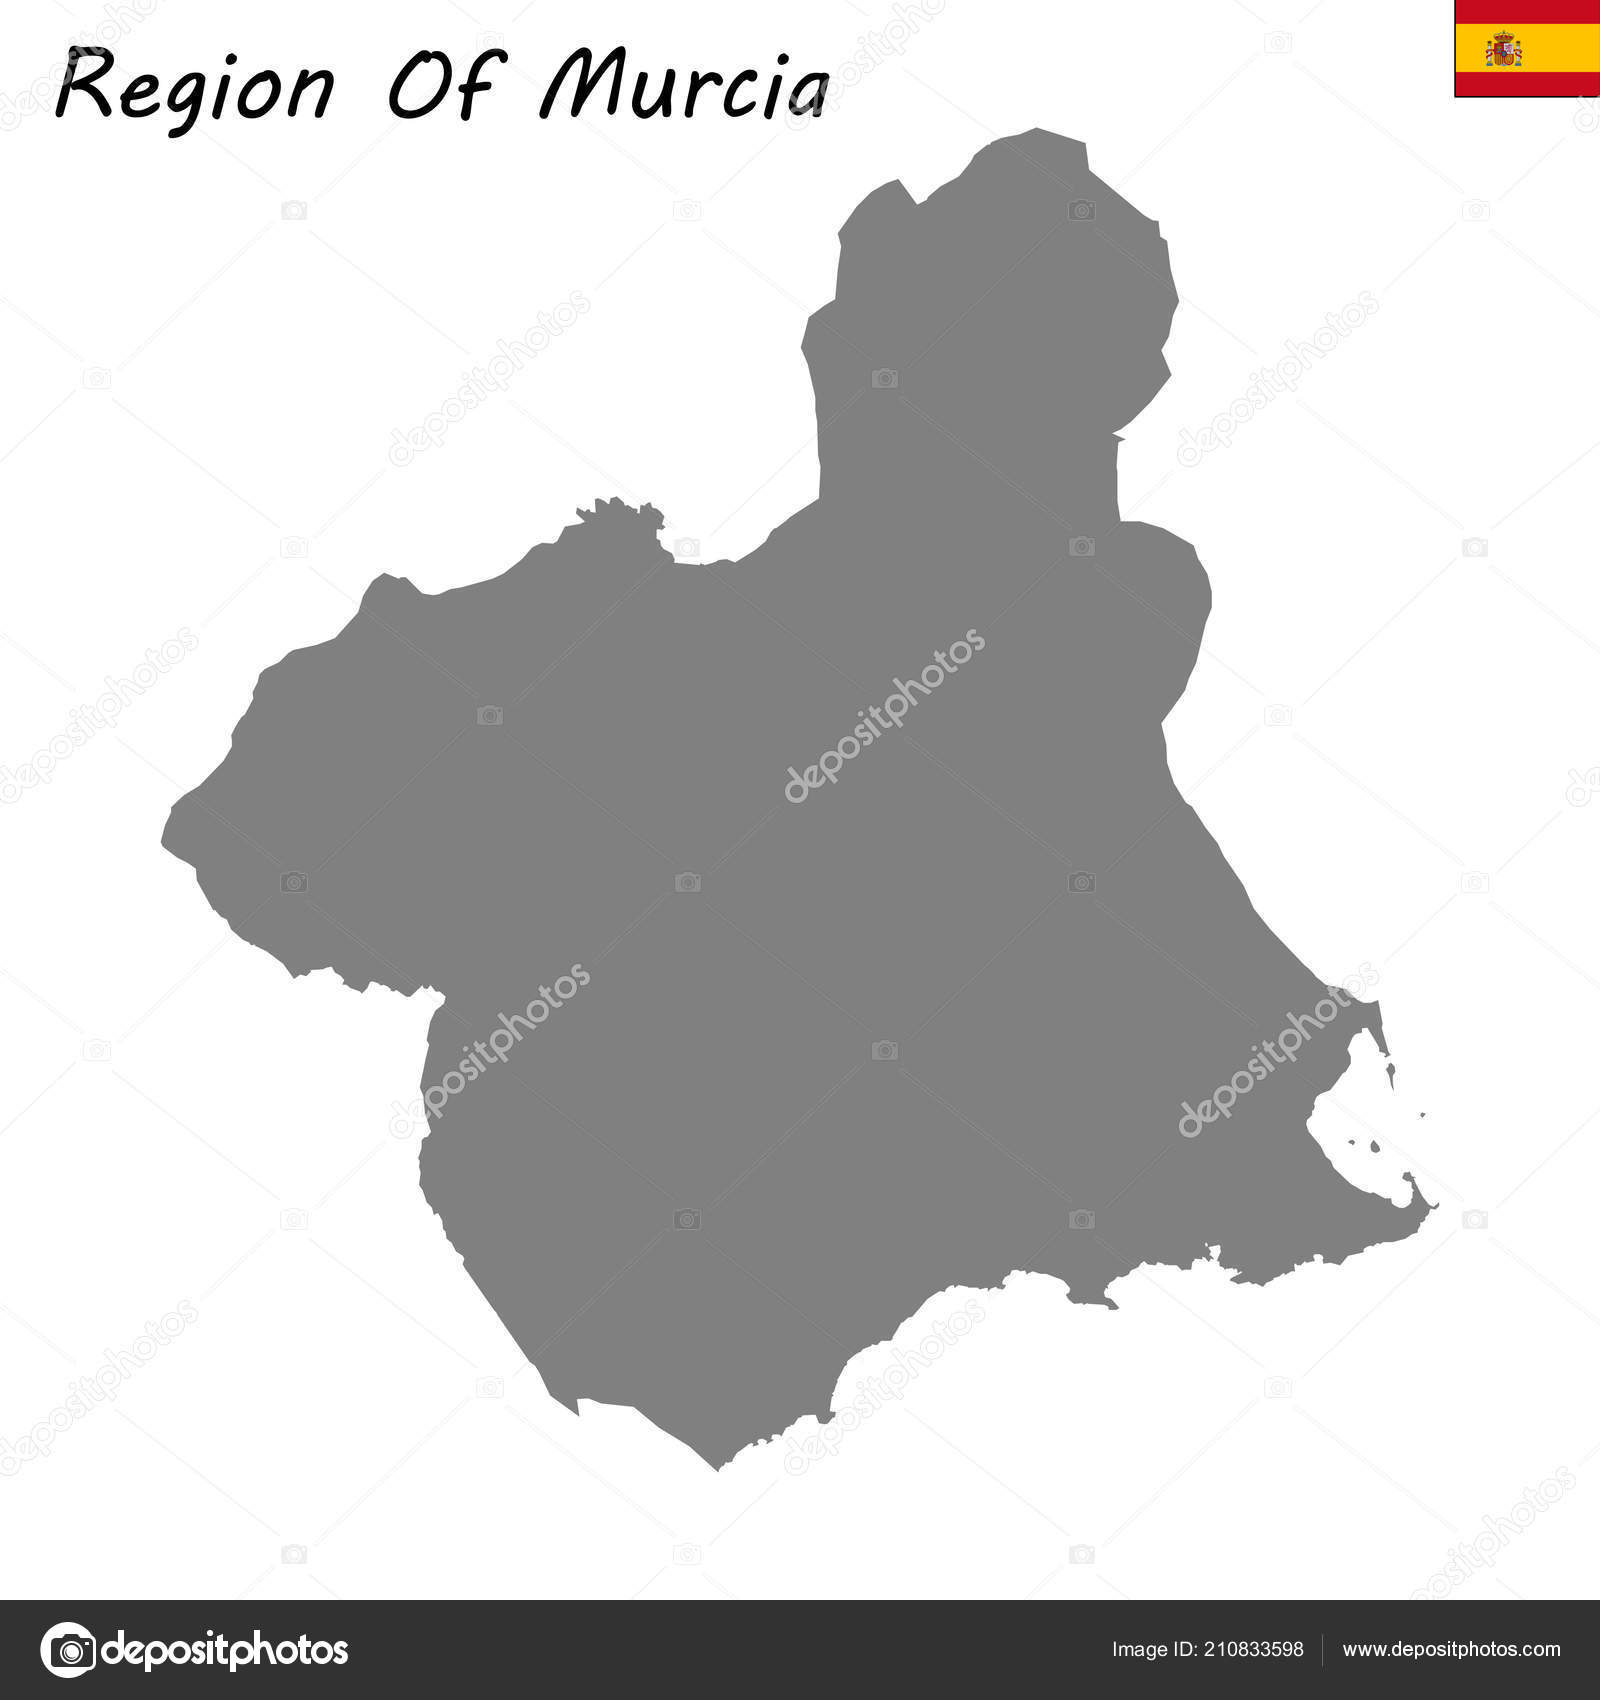 Mapa Region De Murcia.High Quality Map Region Murcia Stock Vector